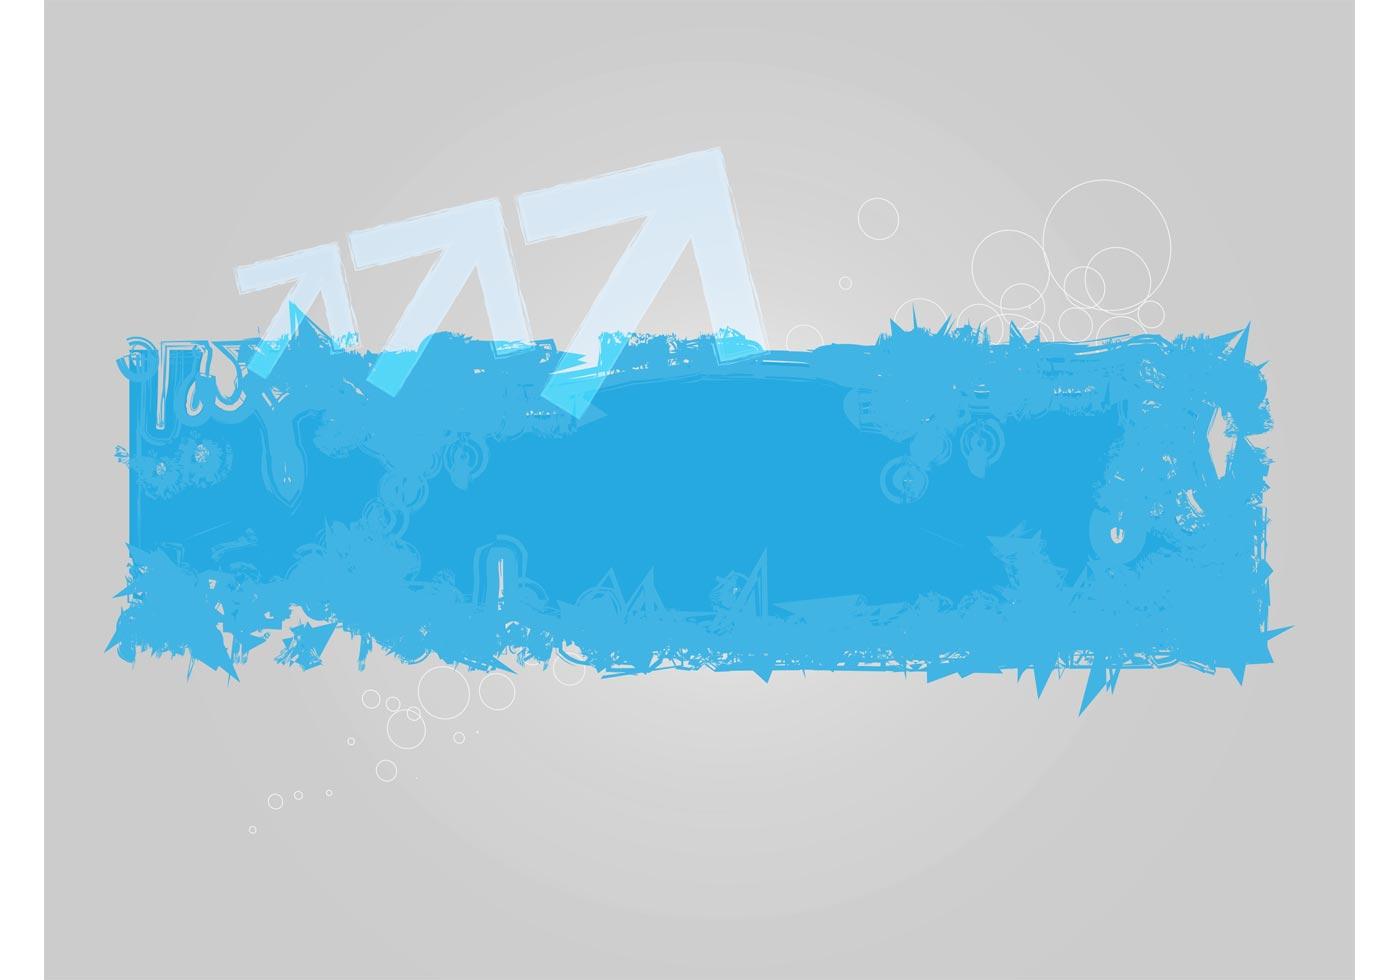 Flash Banner - Joomla! Documentation